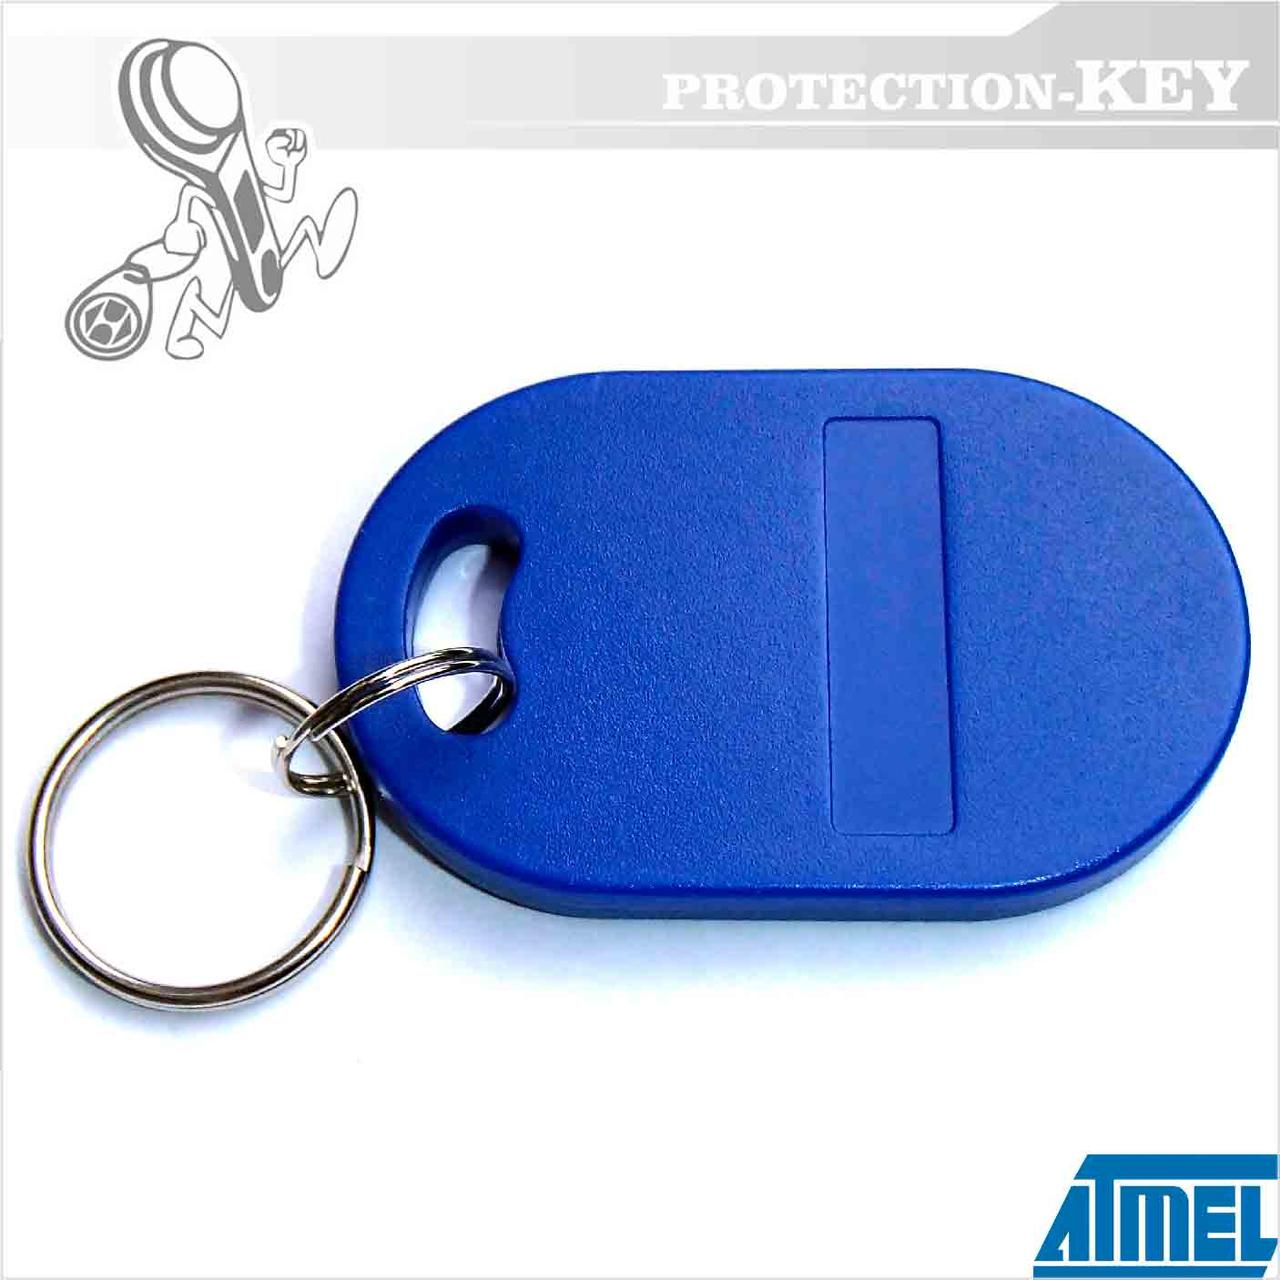 Брелок-заготовка Т5577 Shaped для копирования RFID ключей 125 KHz